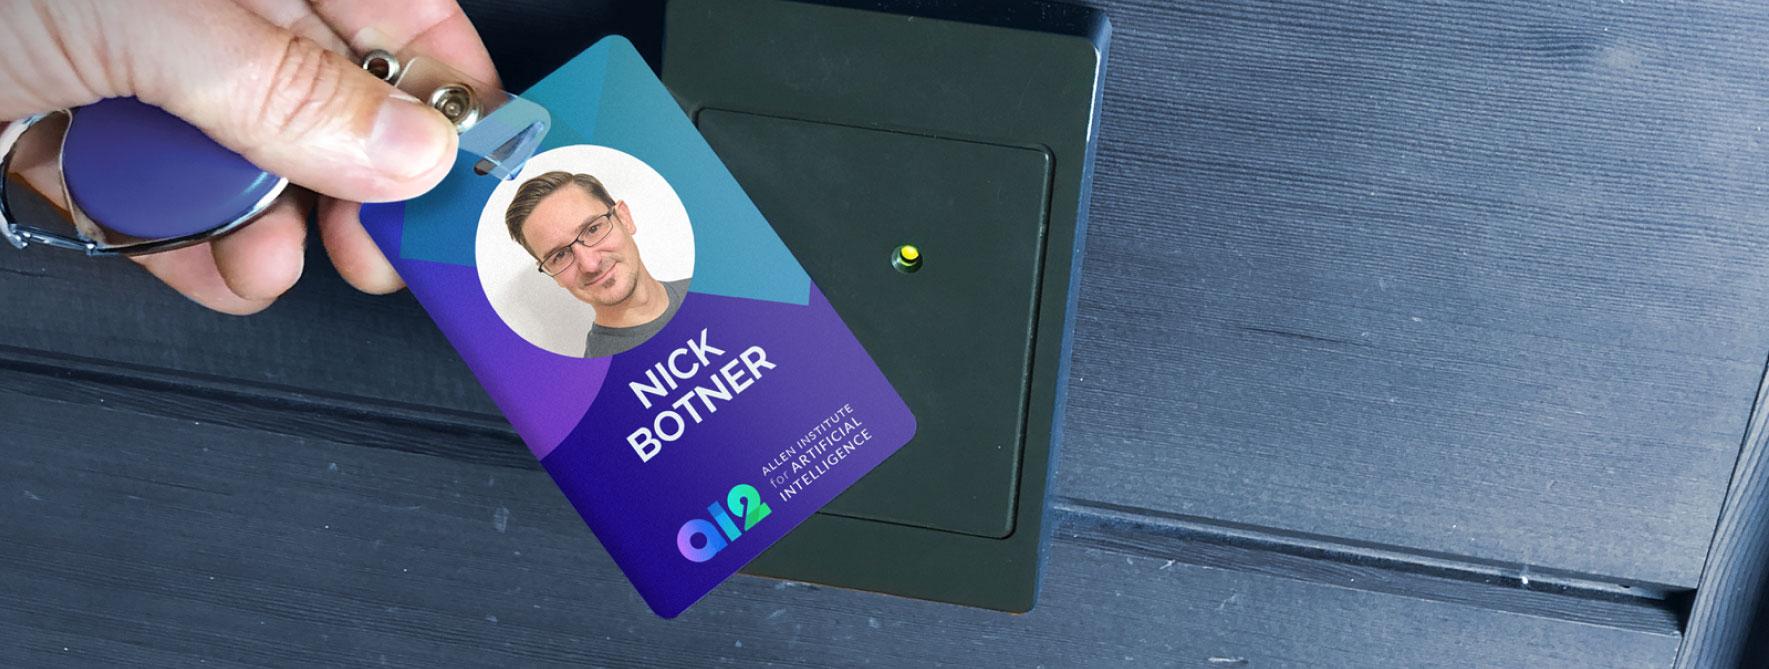 c2-access-card